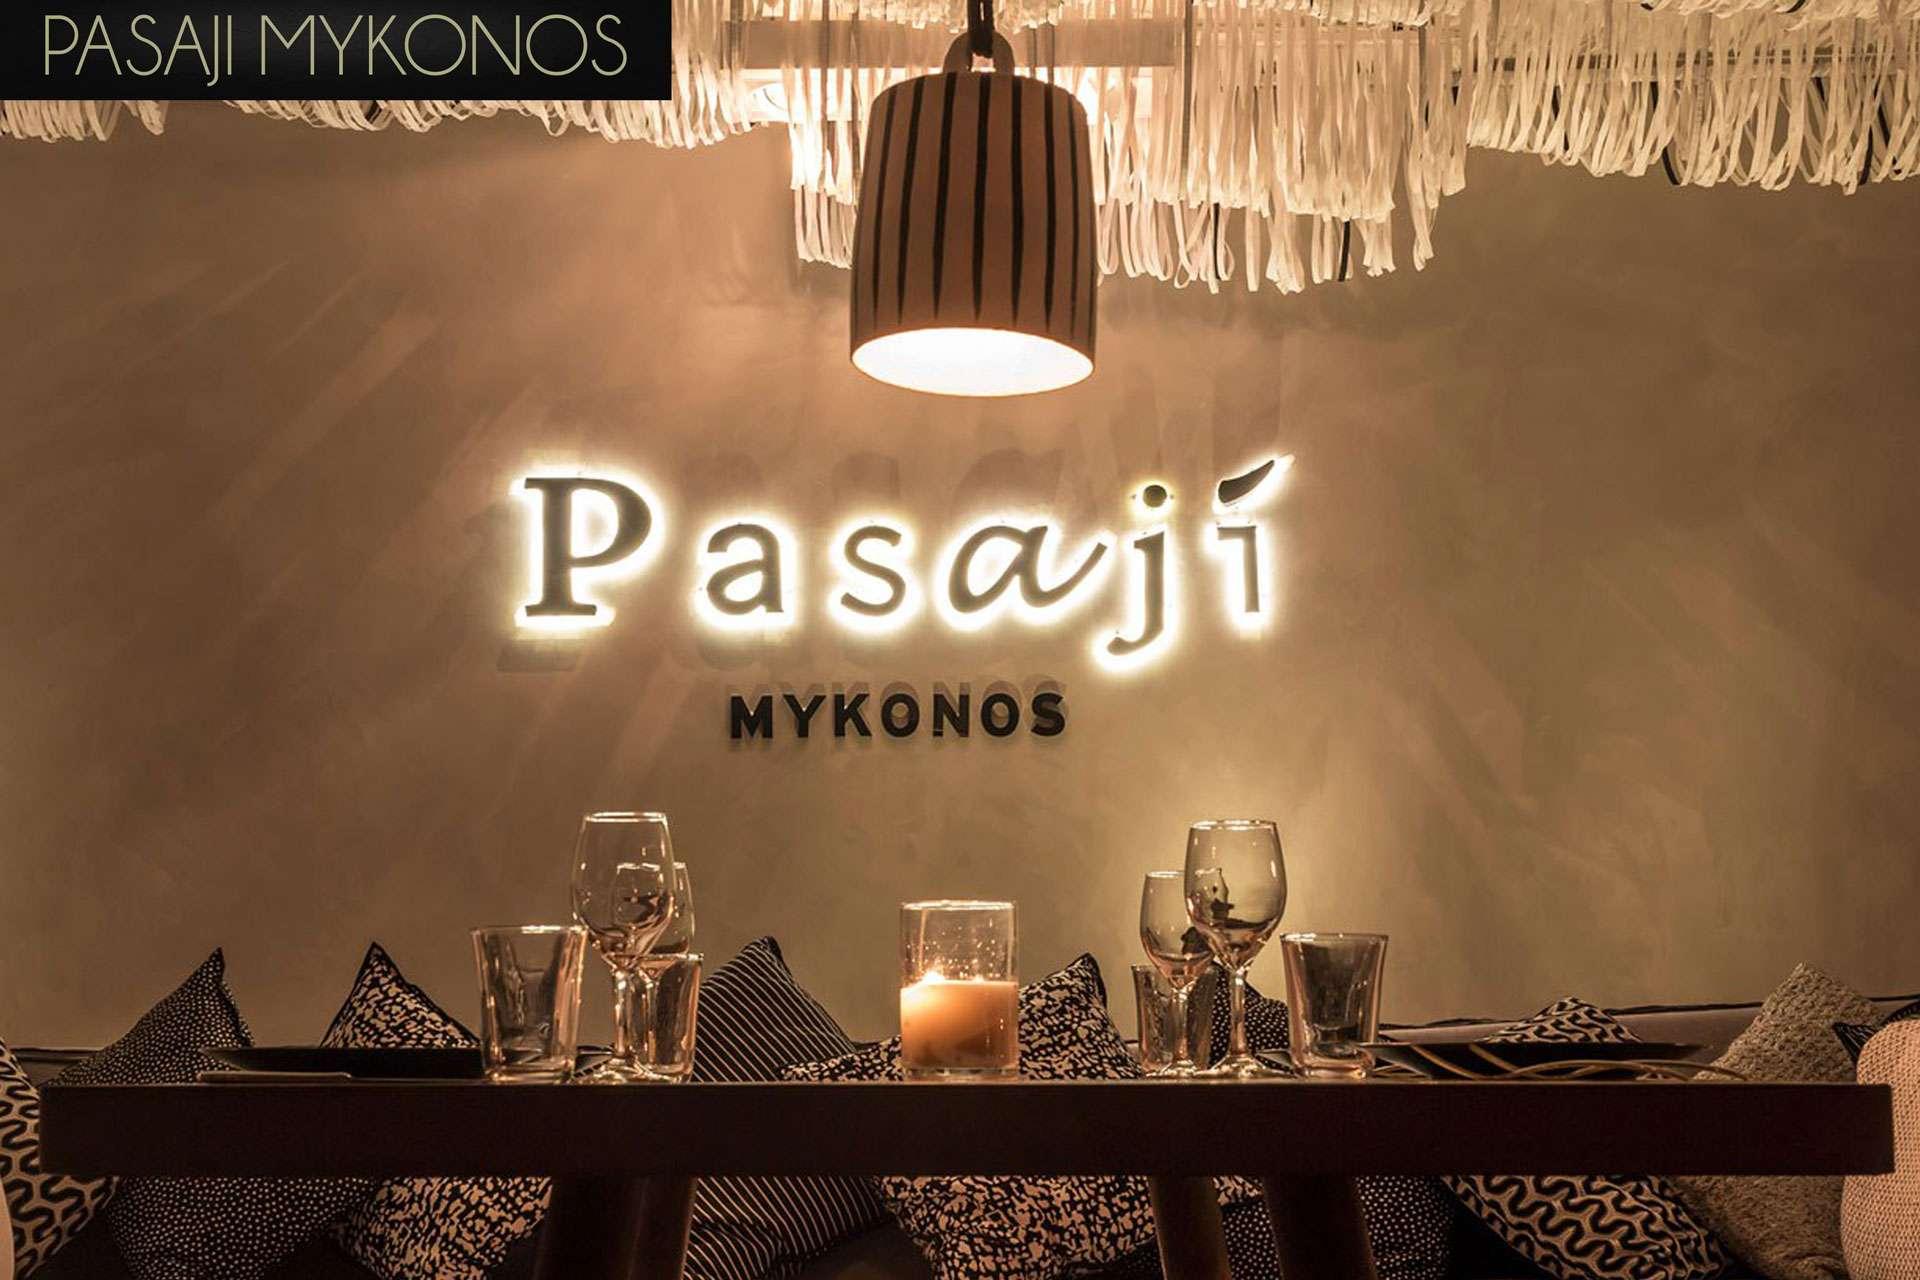 mykonos-restaurants-pasaji-mykonos-restaurant